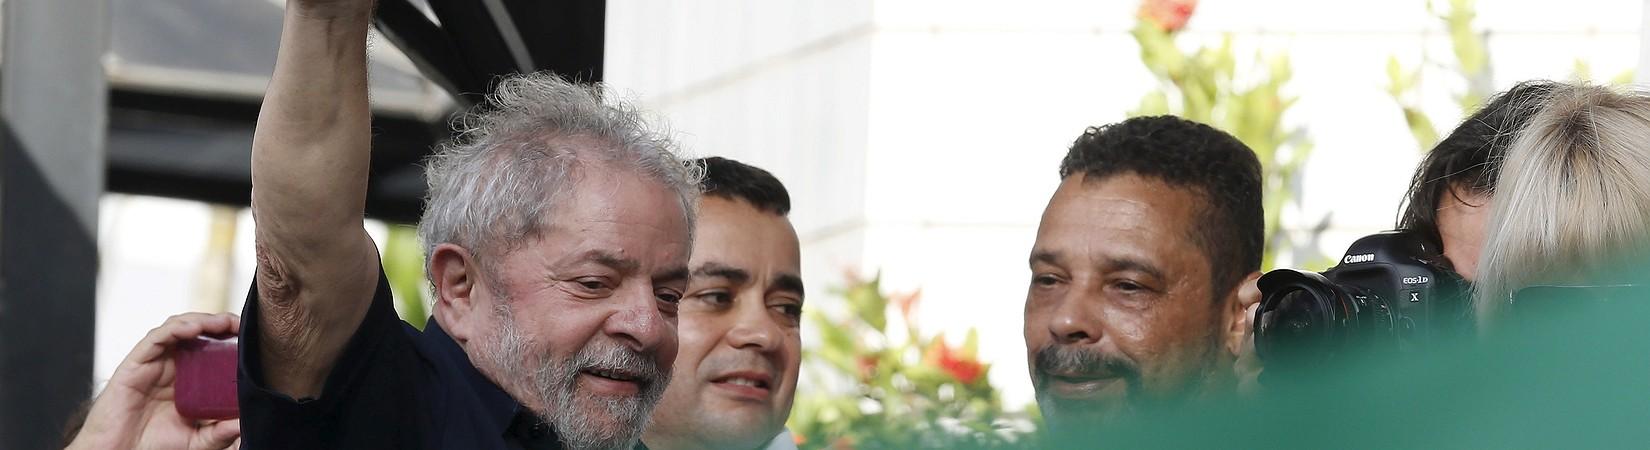 La Fiscalía brasileña presenta cargos penales contra Lula Da Silva